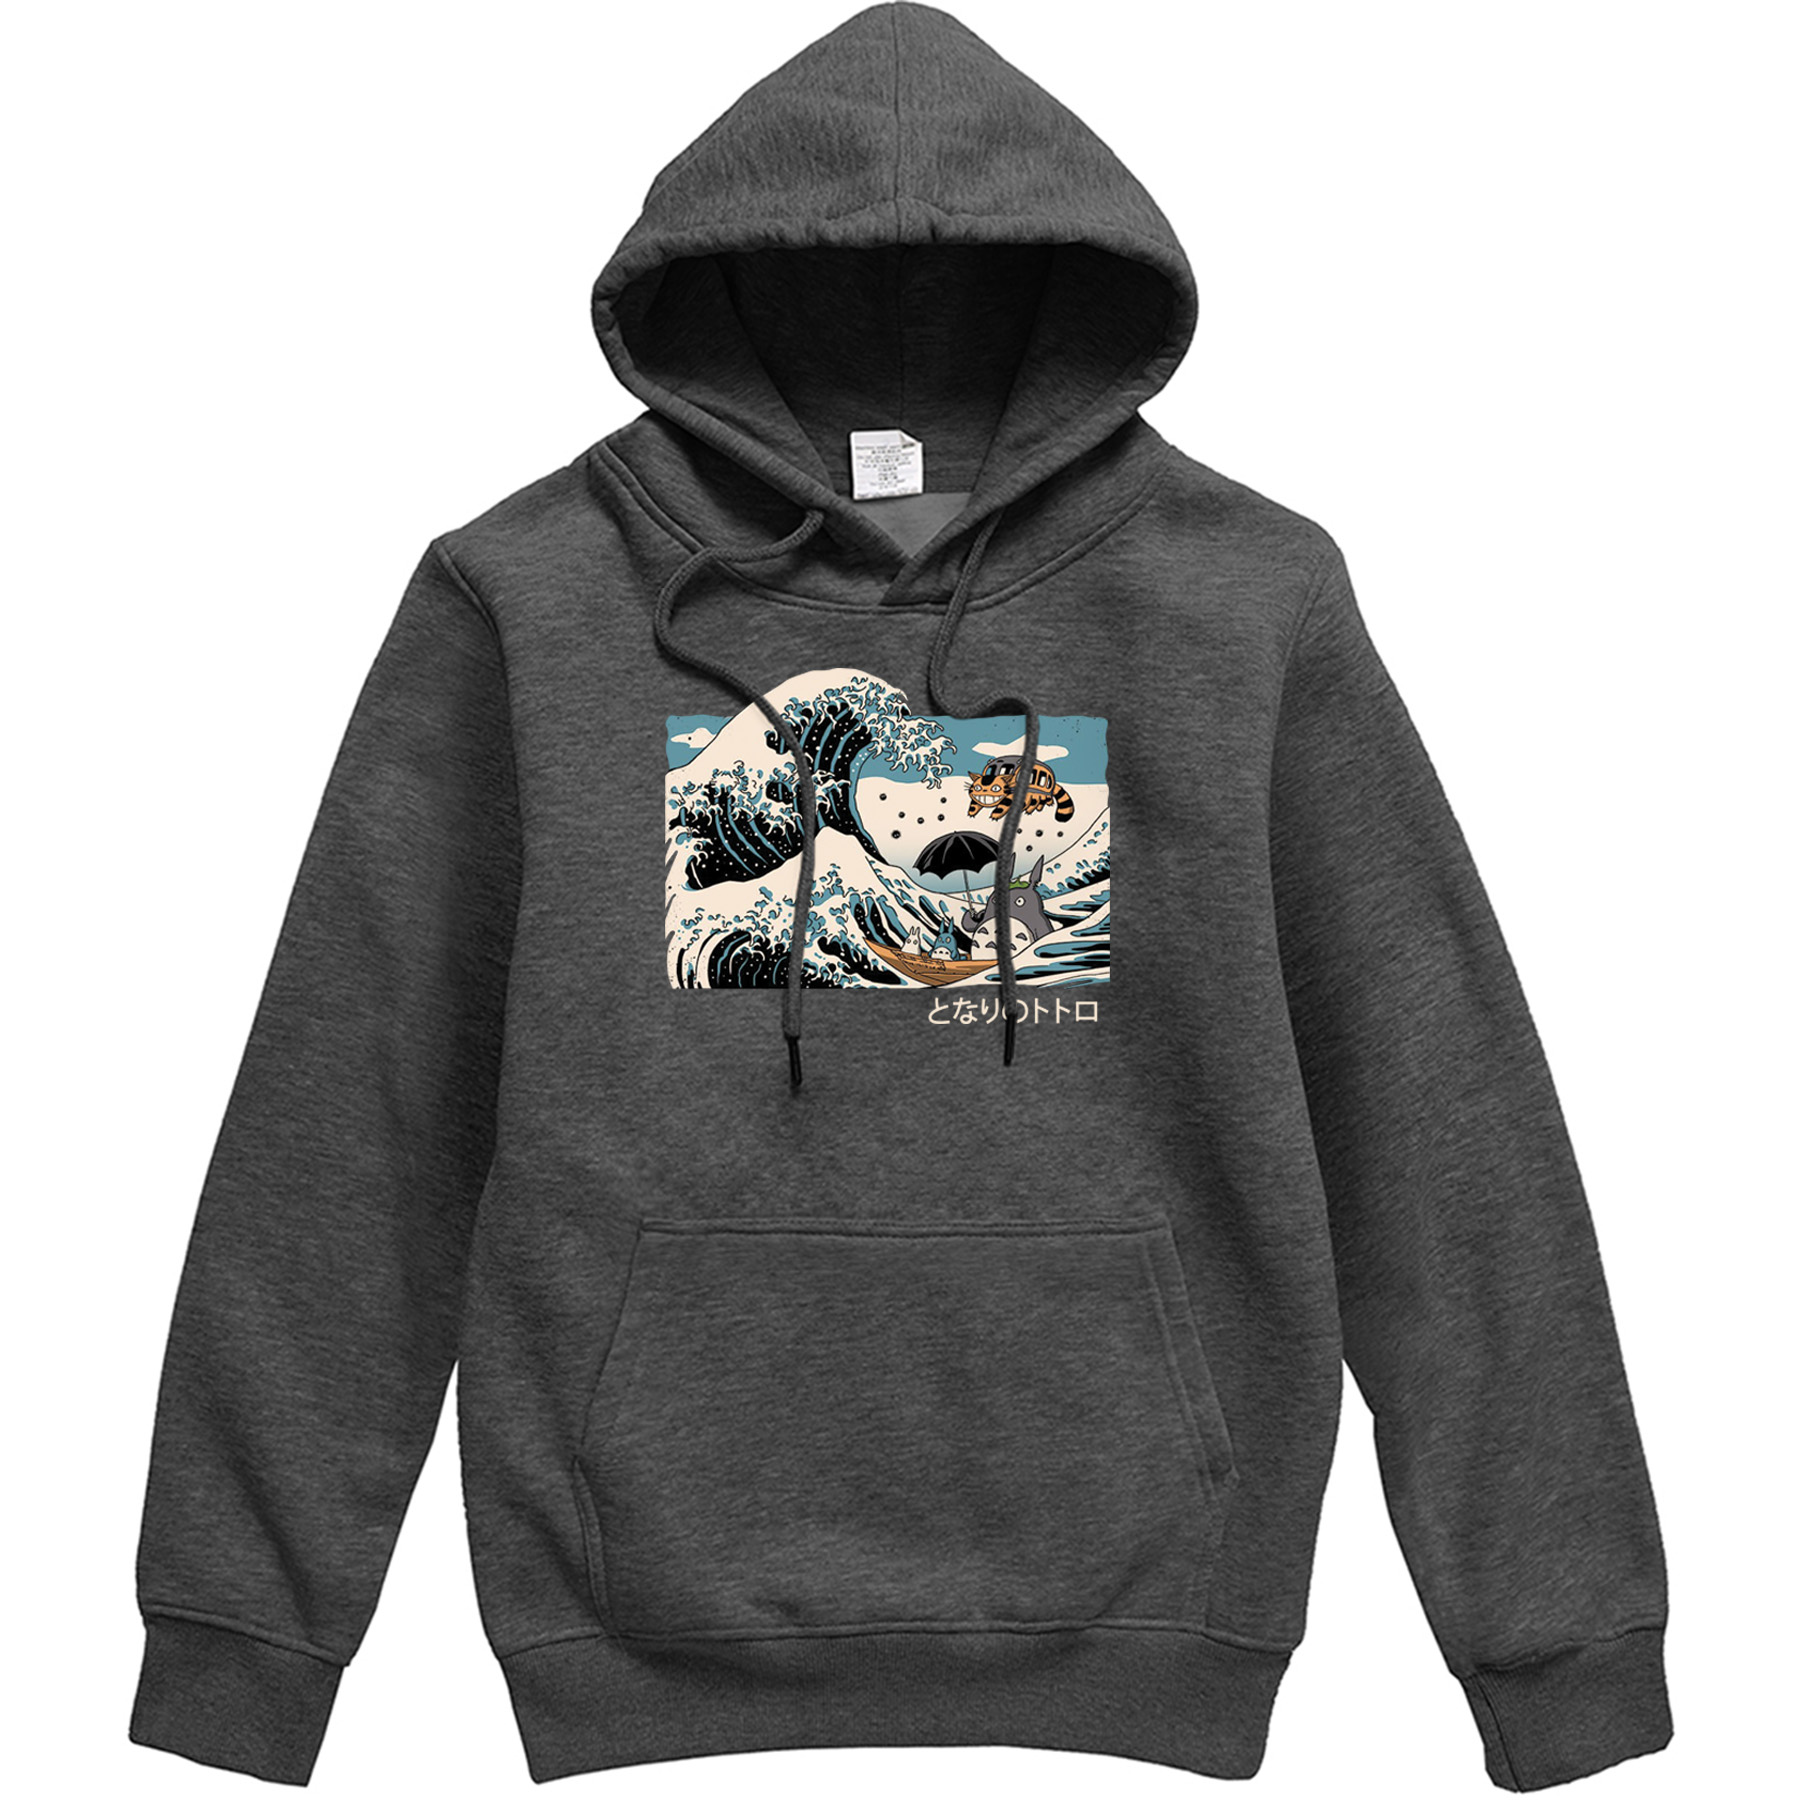 Japan Anime Mens Hoodie The Great Wave Totoro Landscape Pattern Mens Pullover Casual Sportswear Men Hip Hop Harajuku Streetwear